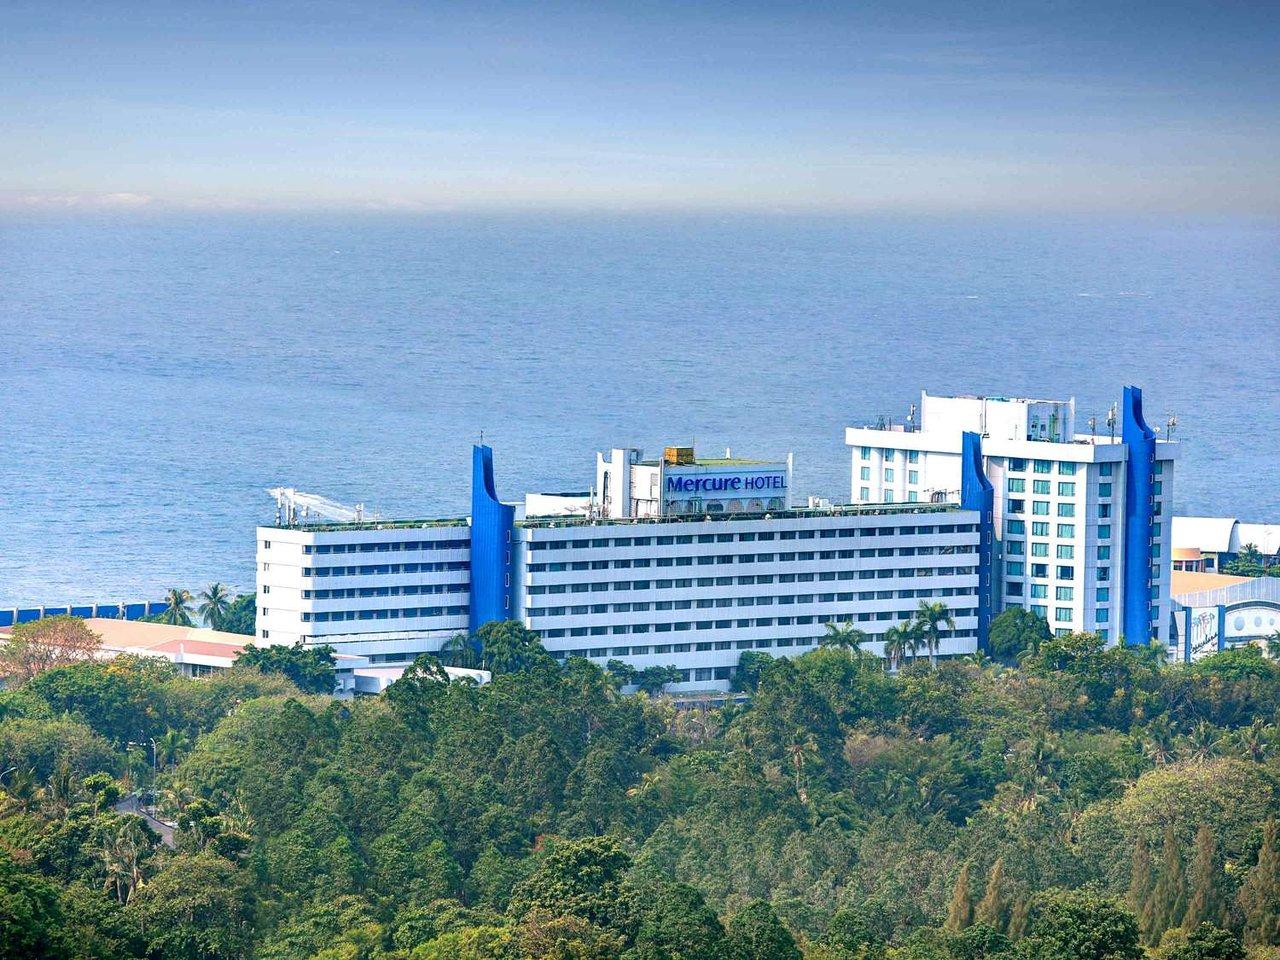 mercure convention center 36 4 5 updated 2019 prices hotel rh tripadvisor com